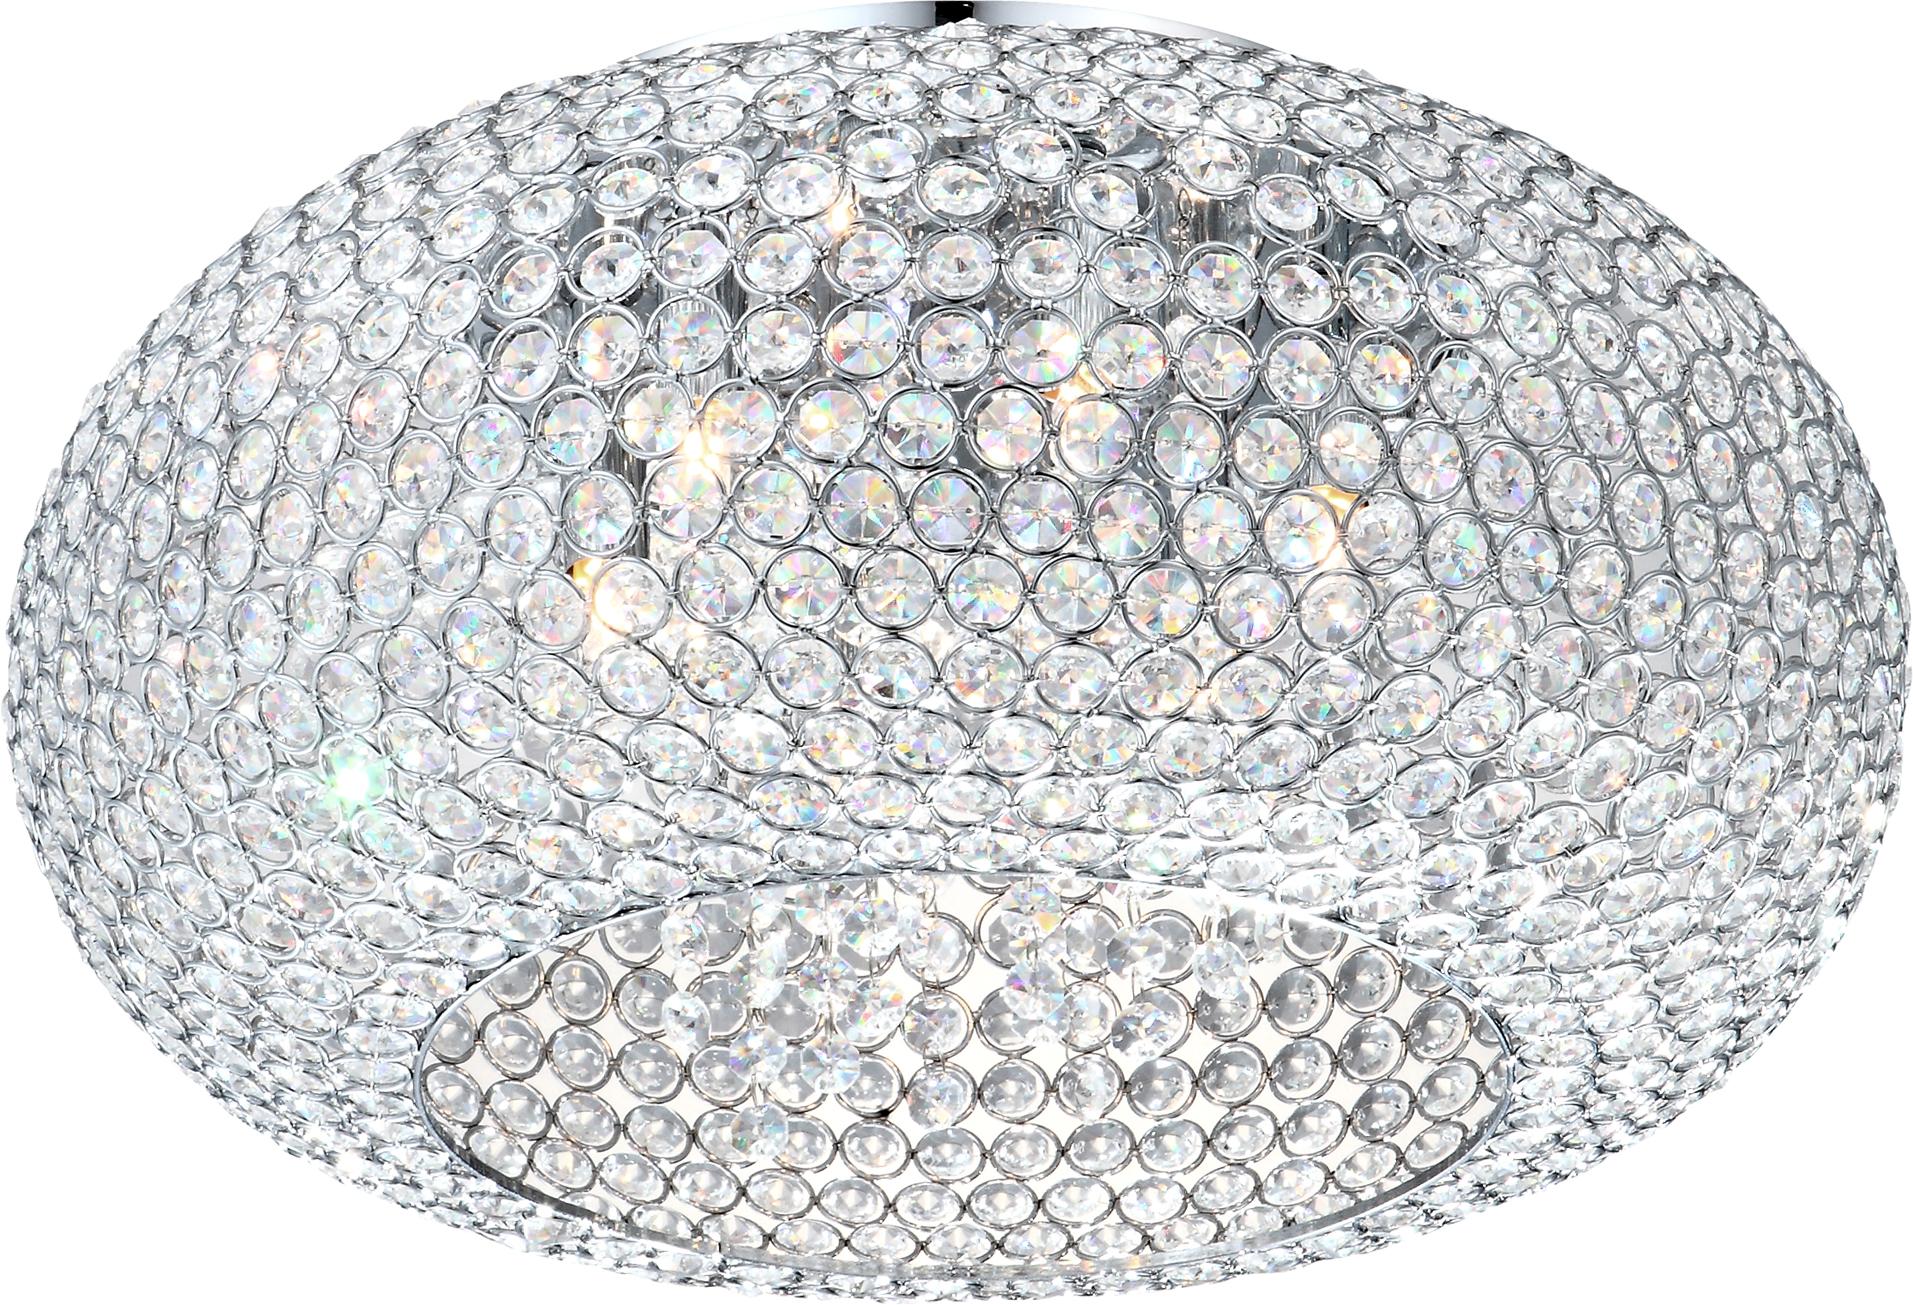 emilia schlafzimmer r ume produkte globo lighting leuchten lampen online kaufen. Black Bedroom Furniture Sets. Home Design Ideas